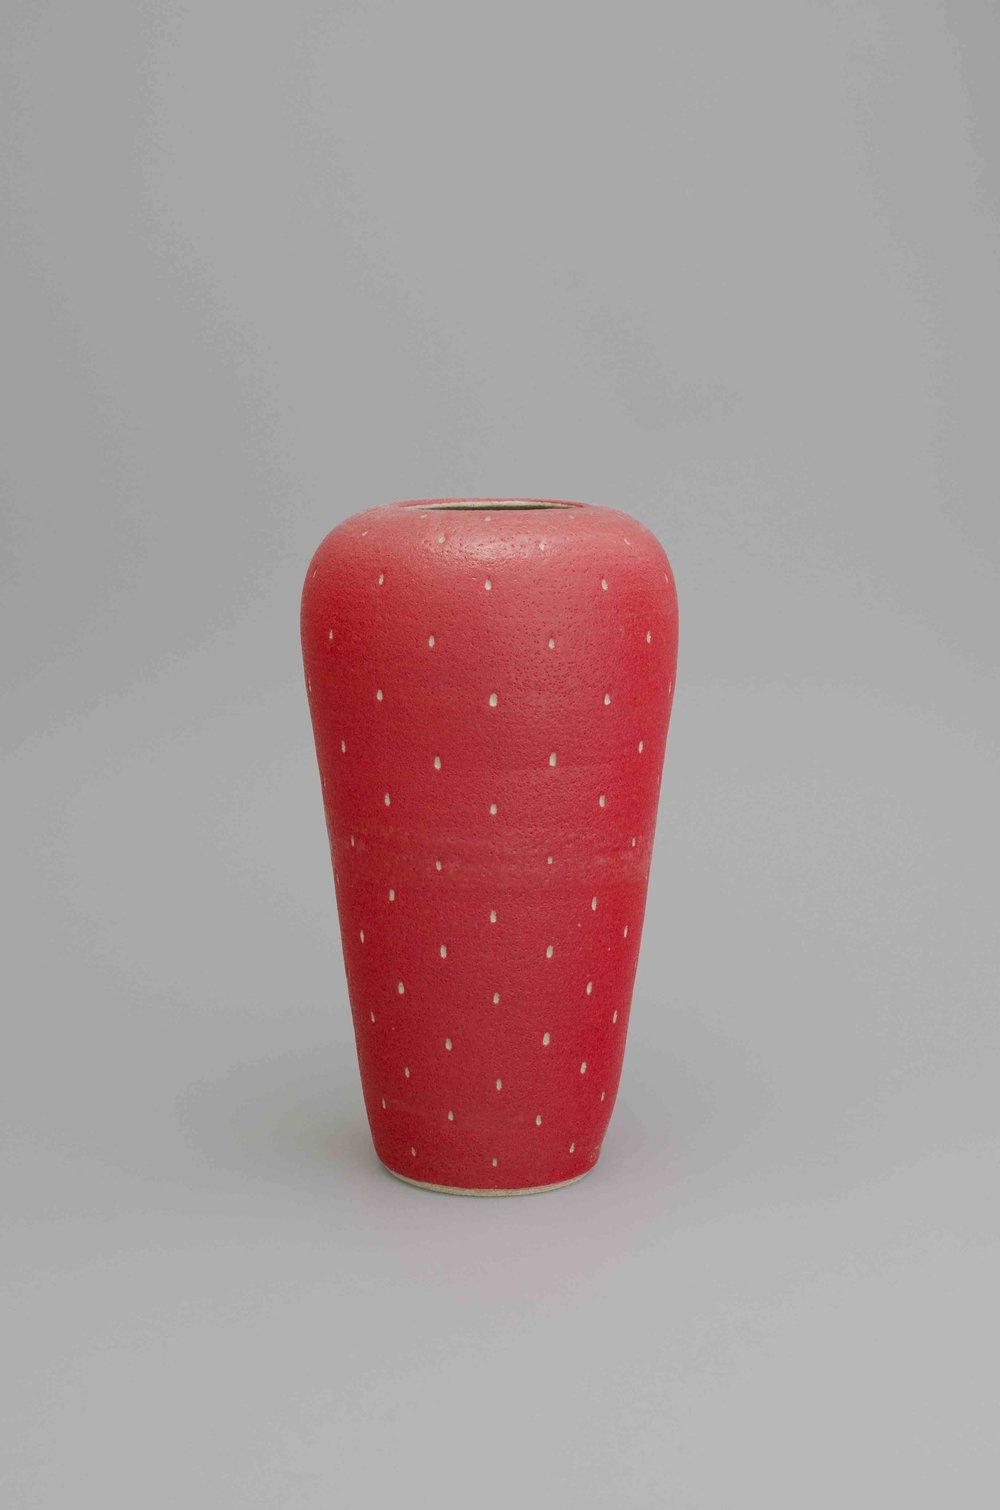 Shio Kusaka  Untitled (strawberry 39)  2015 Stoneware 18 1/2h x 10w x 10d in SK436